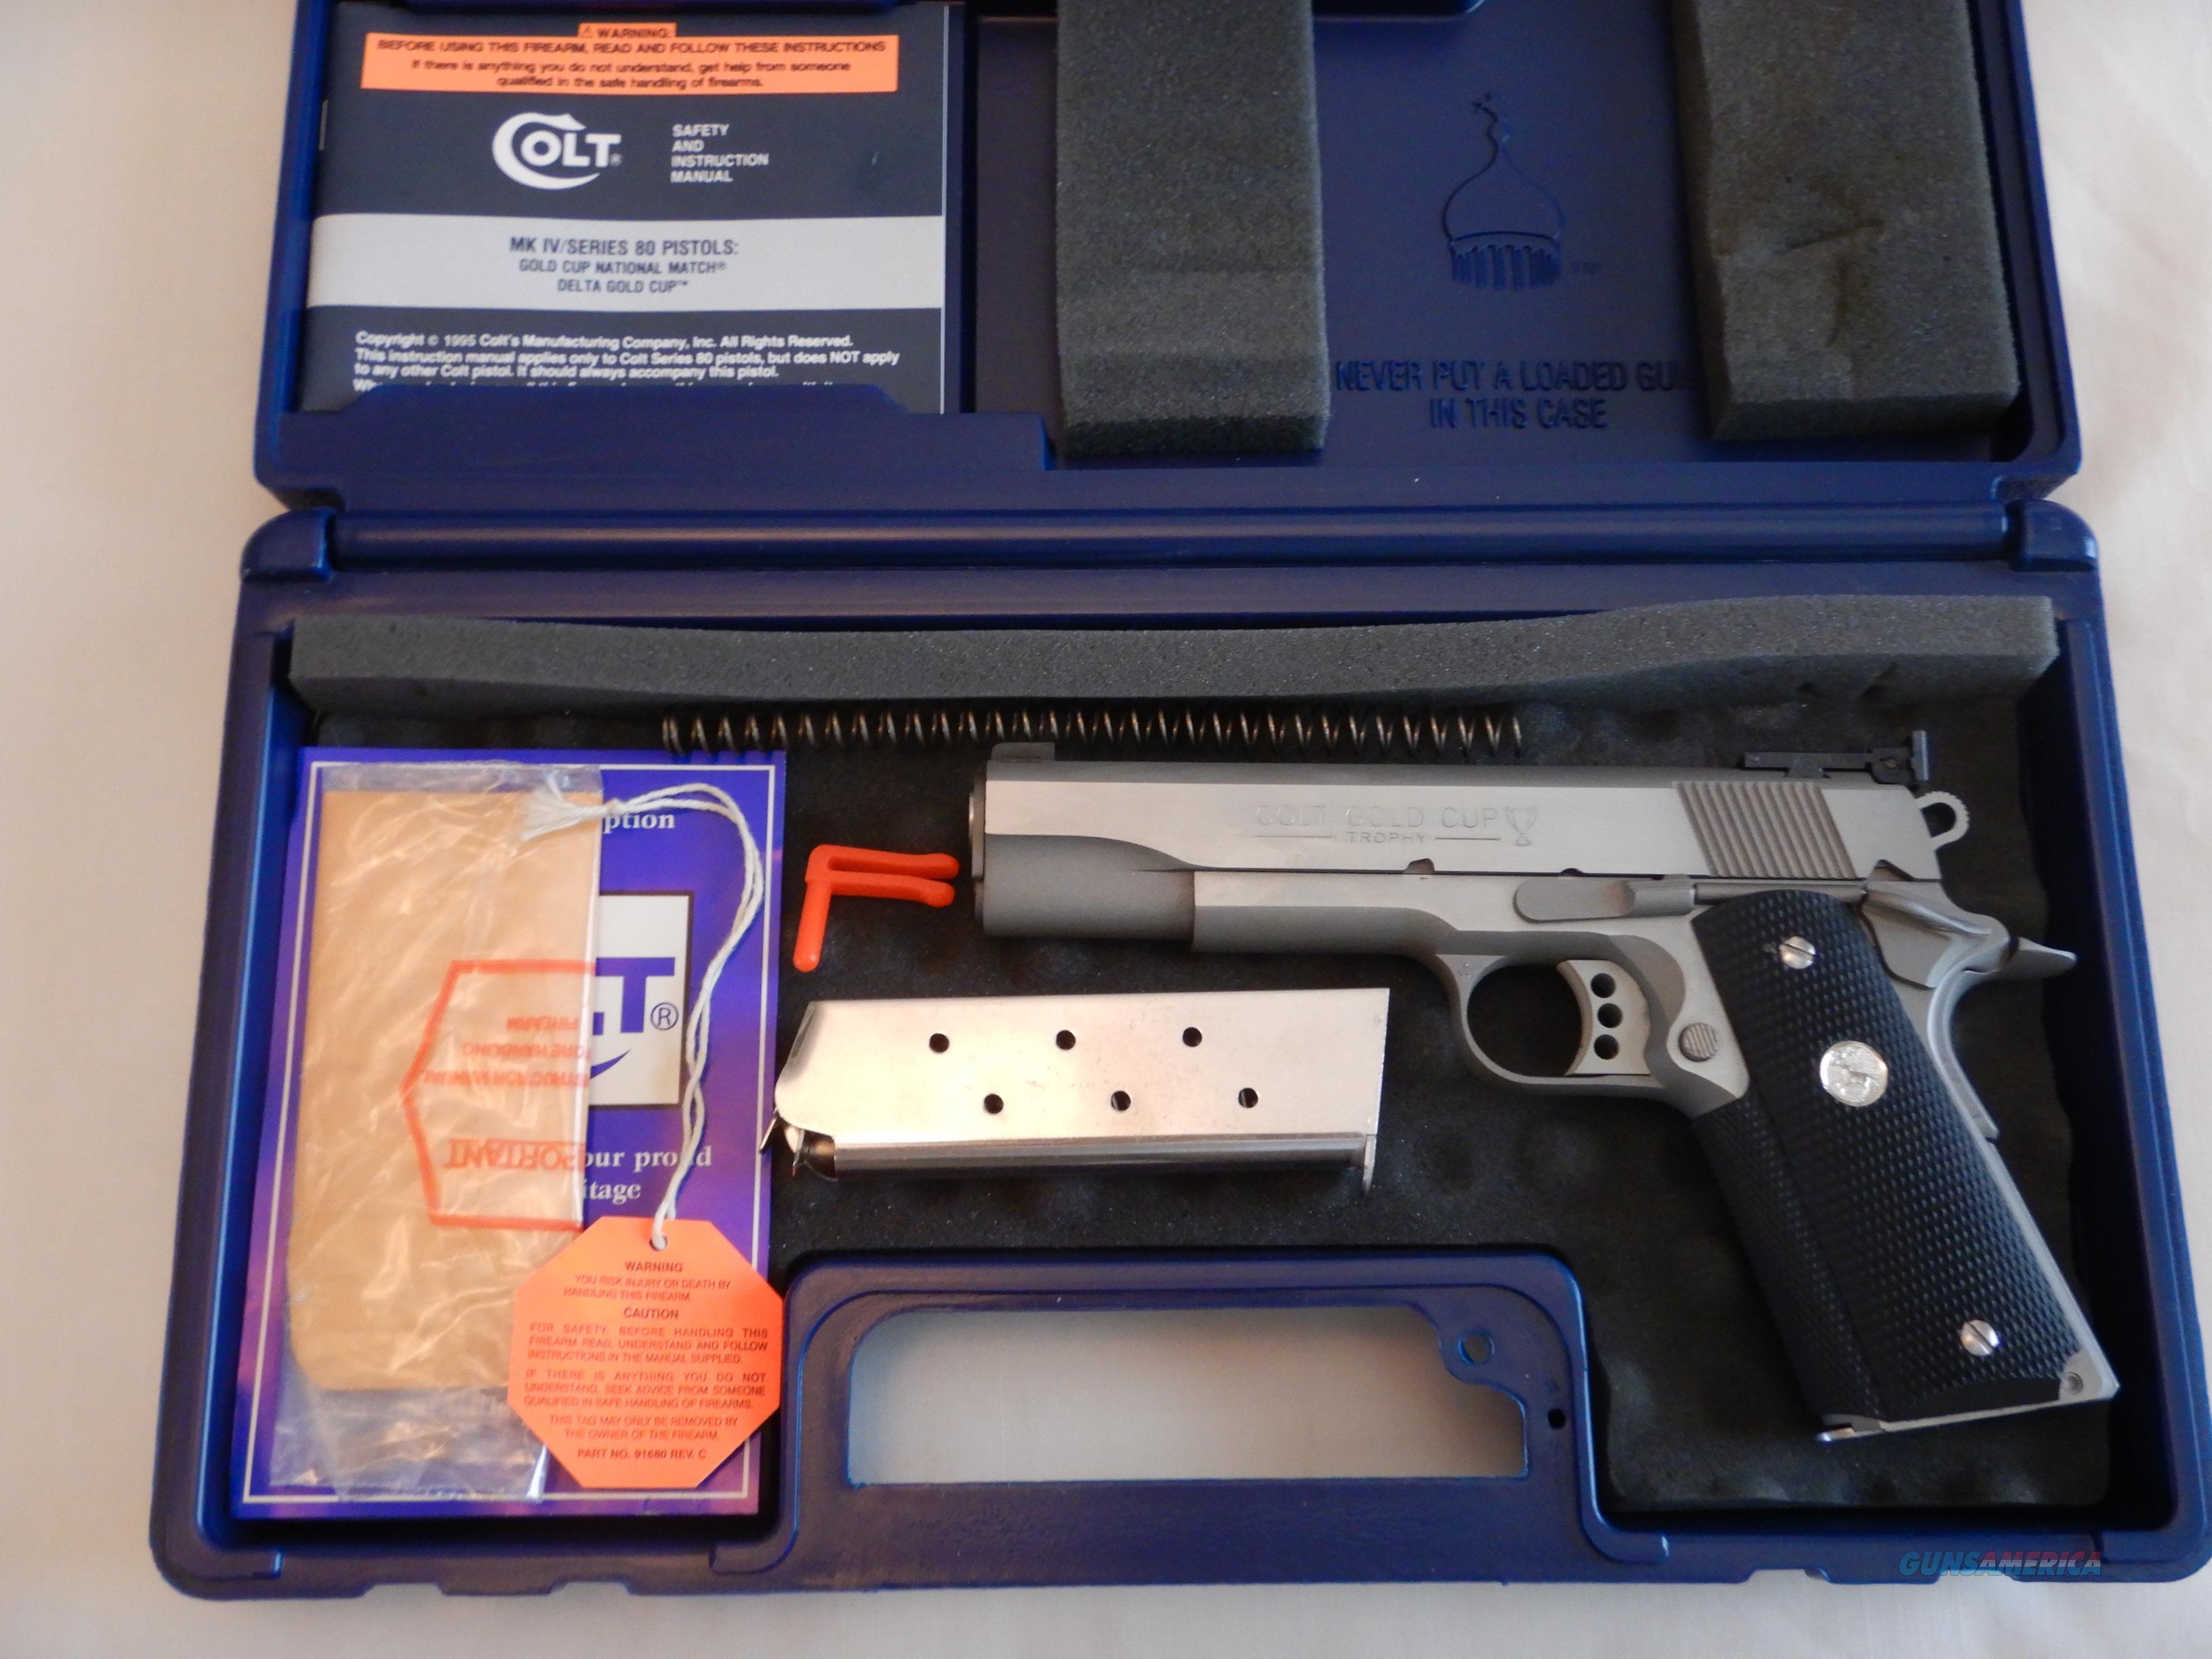 NIB Colt Stainless Steel Gold Cup Trophy  Guns > Pistols > Colt Automatic Pistols (1911 & Var)